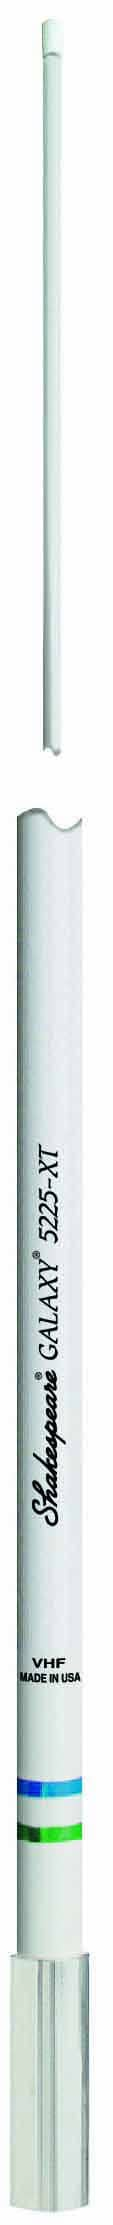 5225-XT - Shakespeare 8' Galaxy Vhf Antenna 6Db W/Stainless Steel Ferrule